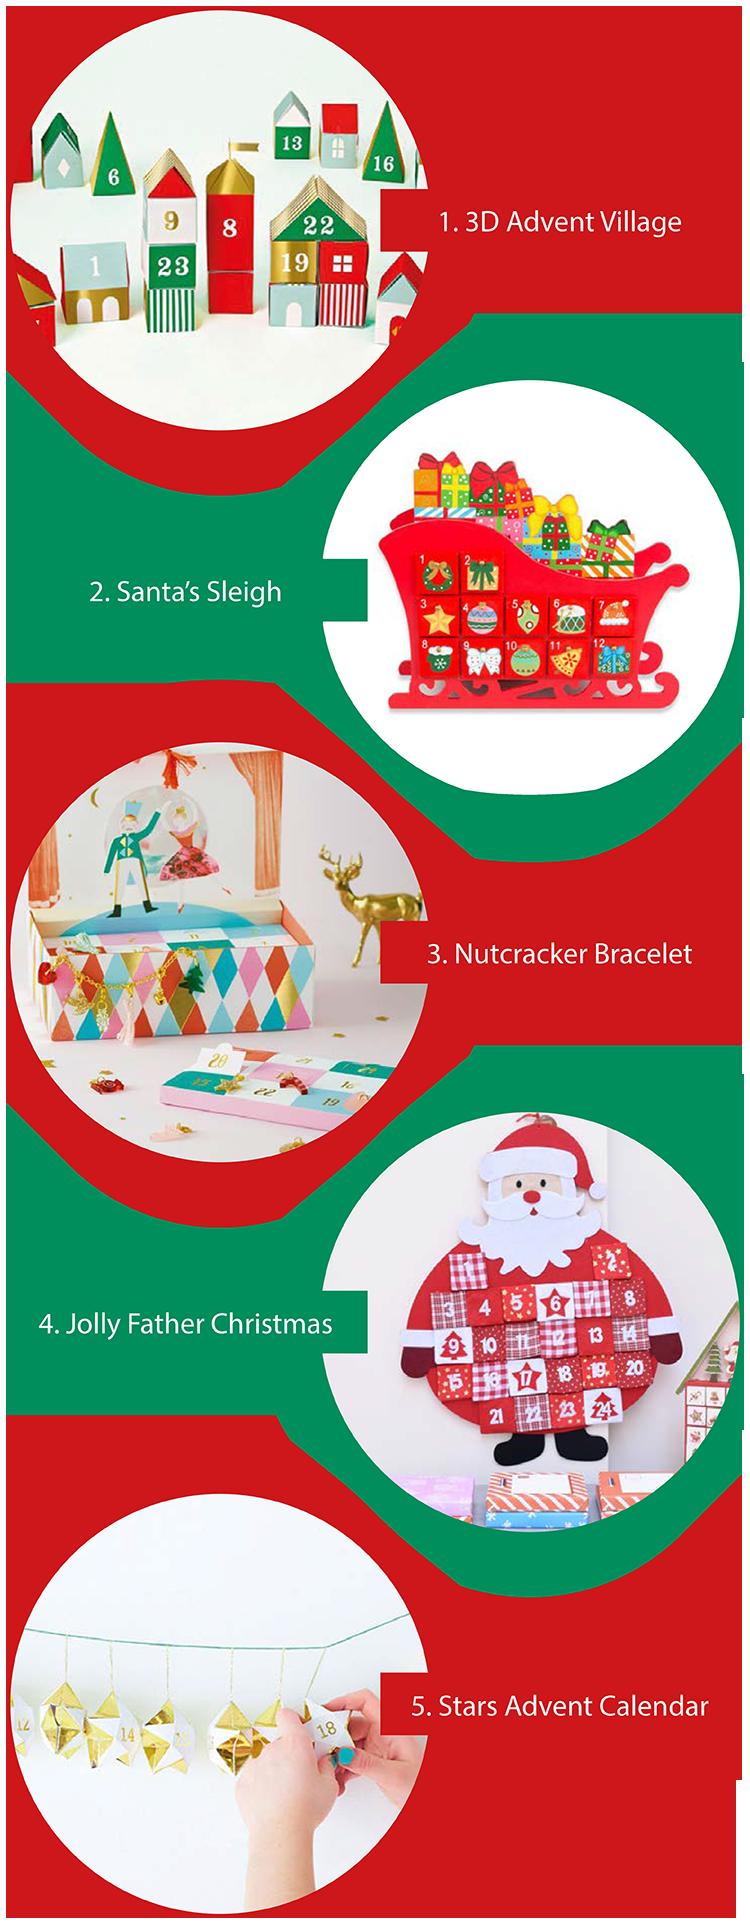 5 Favourite Advent Calendars - Party Pieces Blog & Inspiration